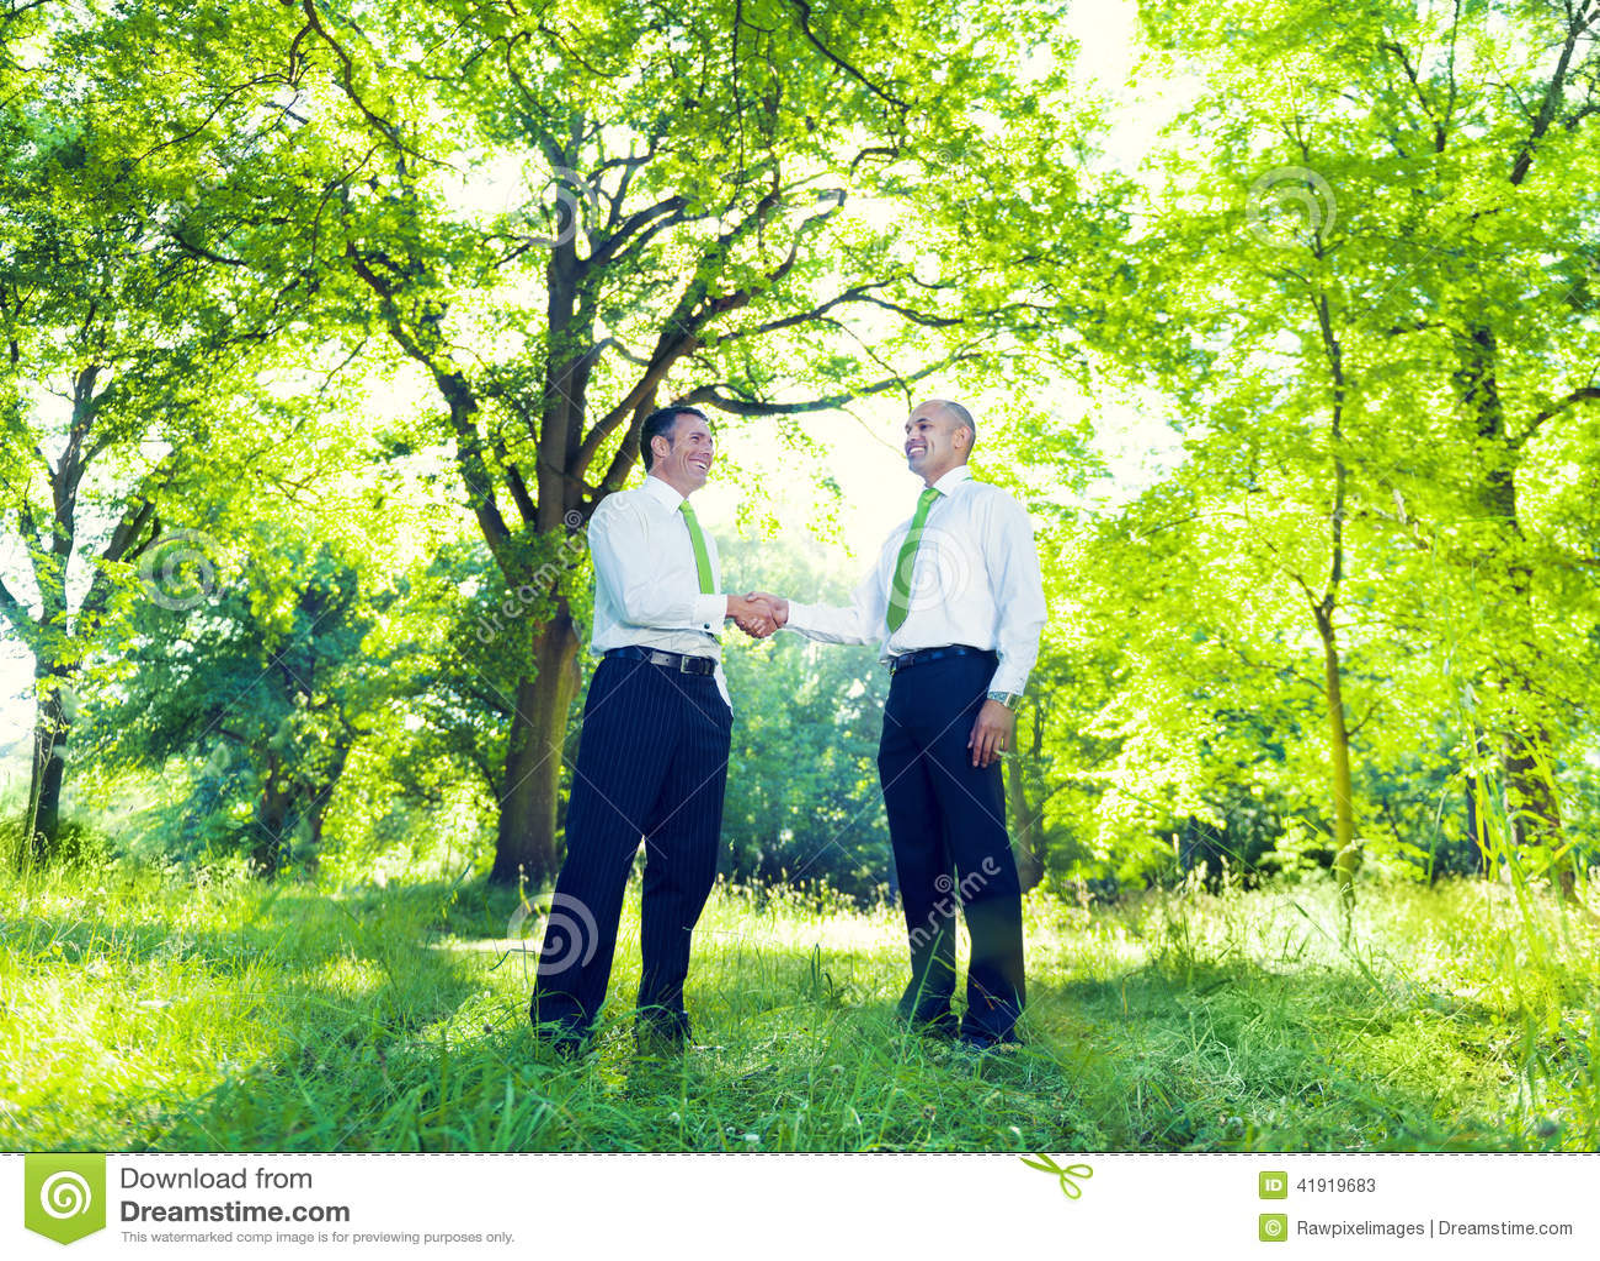 Geschäftsmannhändeschütteln im Garten